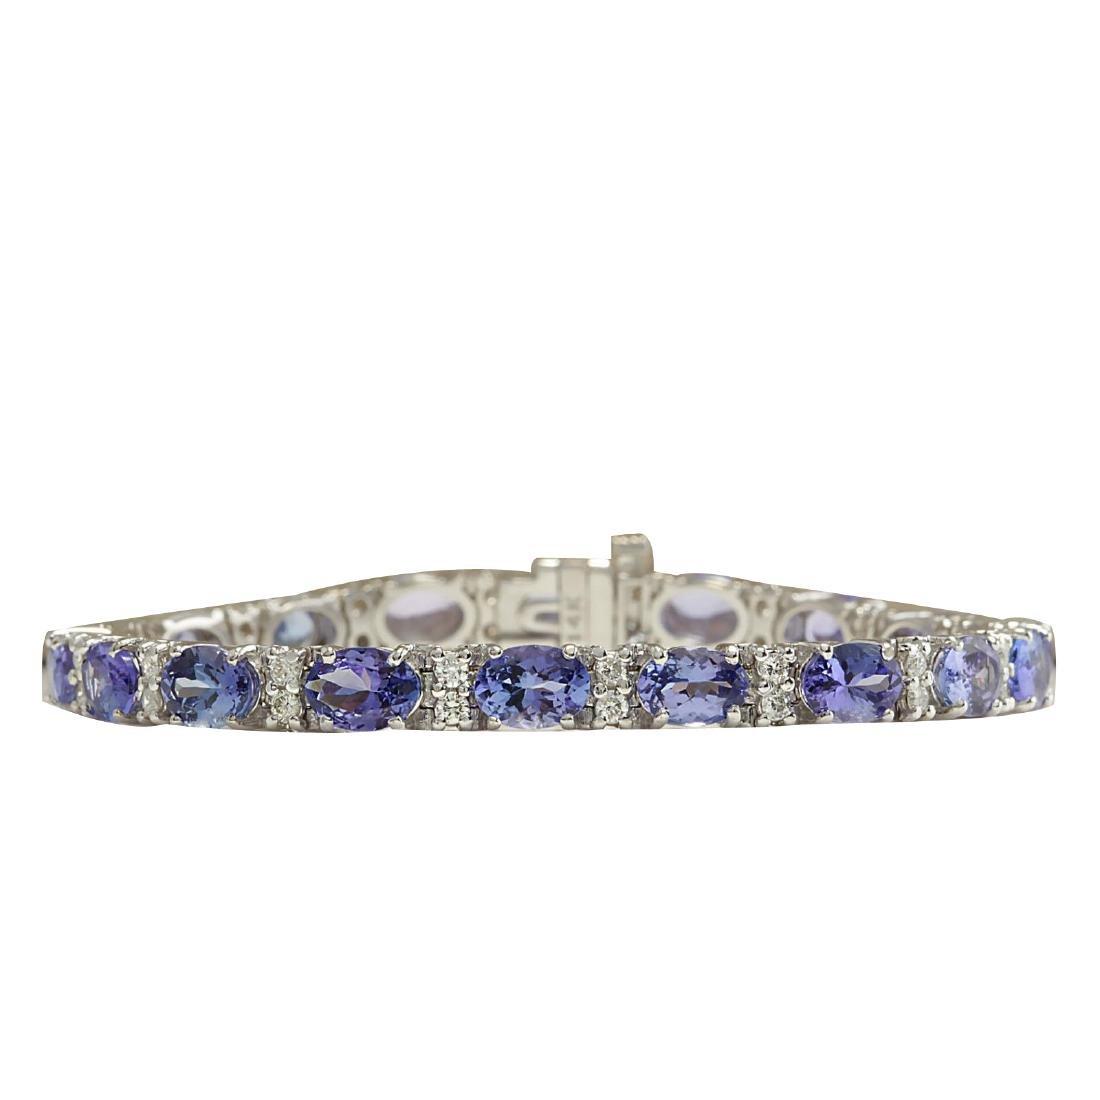 15.95CTW Natural Tanzanite And Diamond Bracelet In 18K